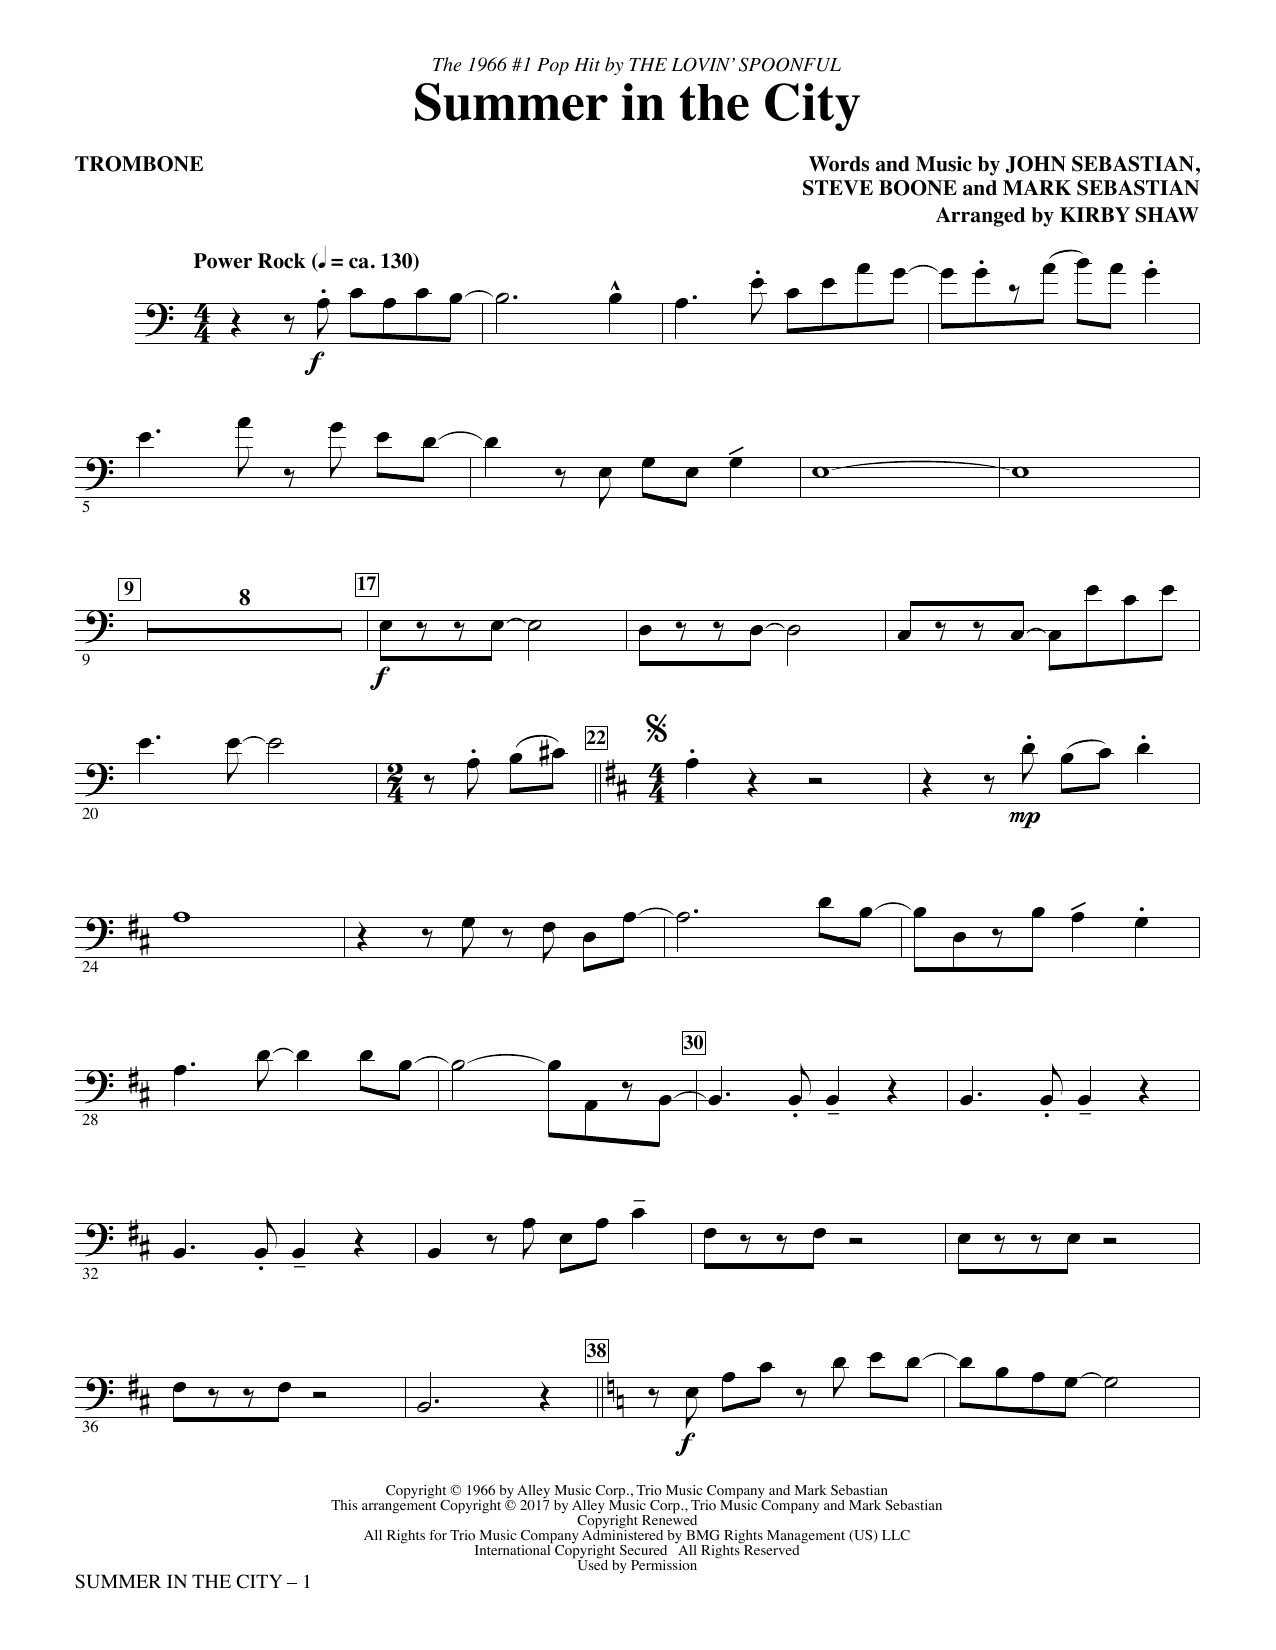 The Lovin' Spoonful - Summer in the City - Trombone